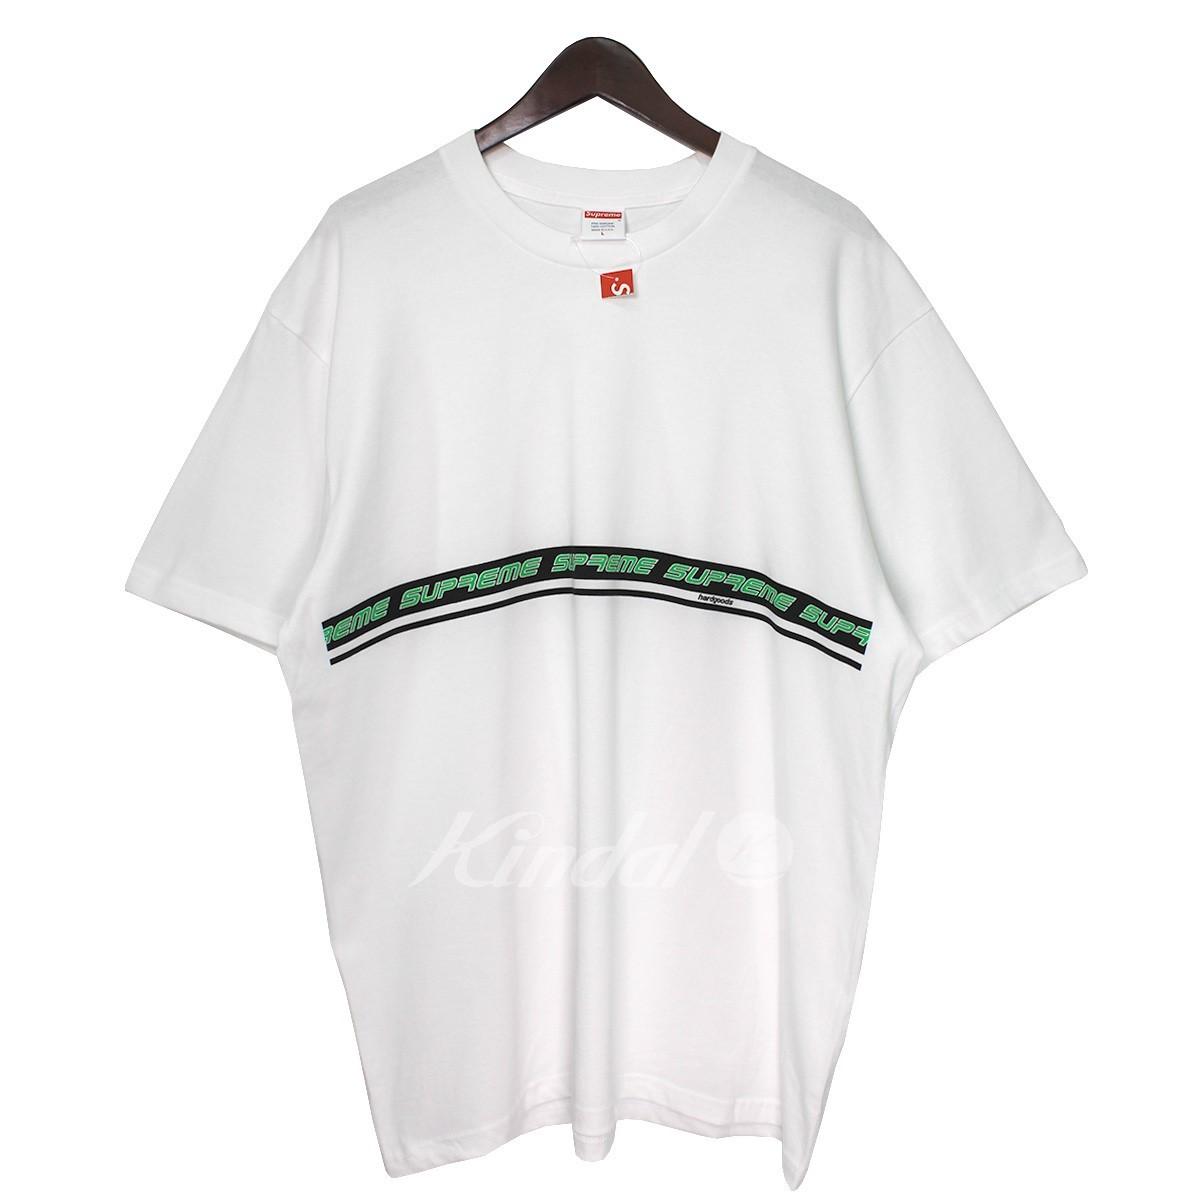 68a0a85a8251 SUPREME 19SS Hard Goods Tee hard goods line logo T-shirt white size: L ...